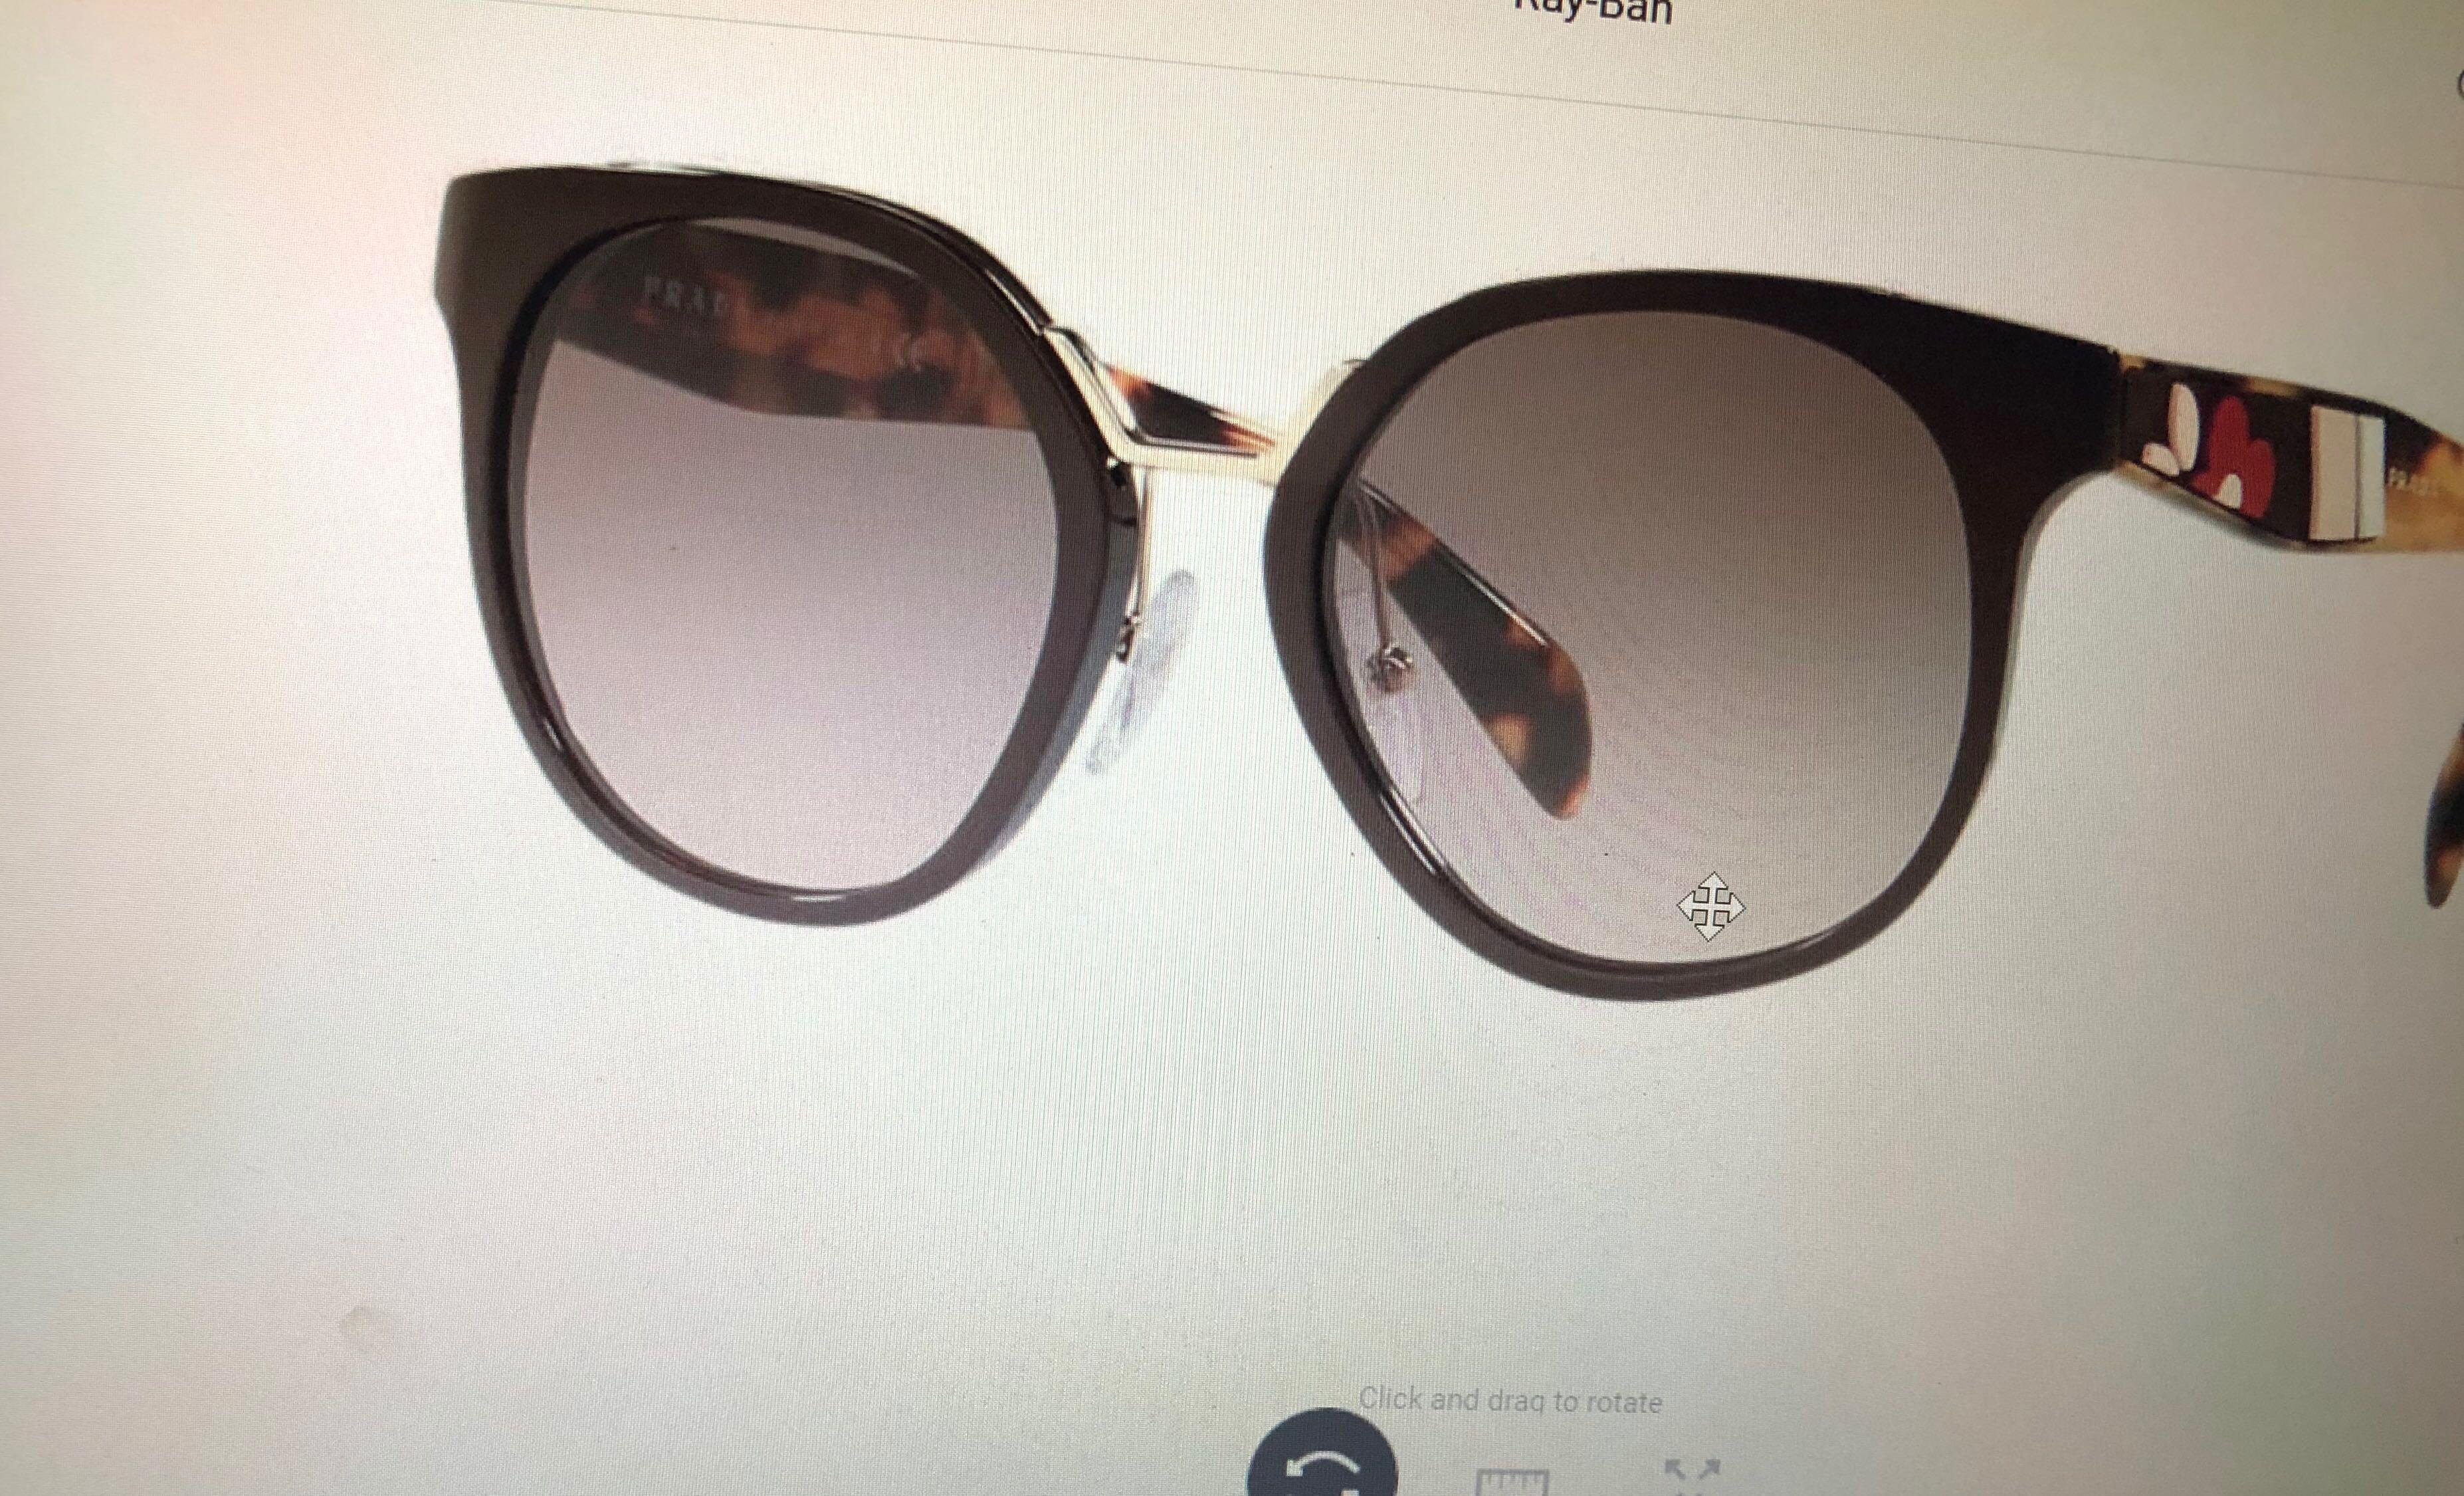 2263ce602151 Home · Women s Fashion · Accessories · Eyewear   Sunglasses. photo photo ...